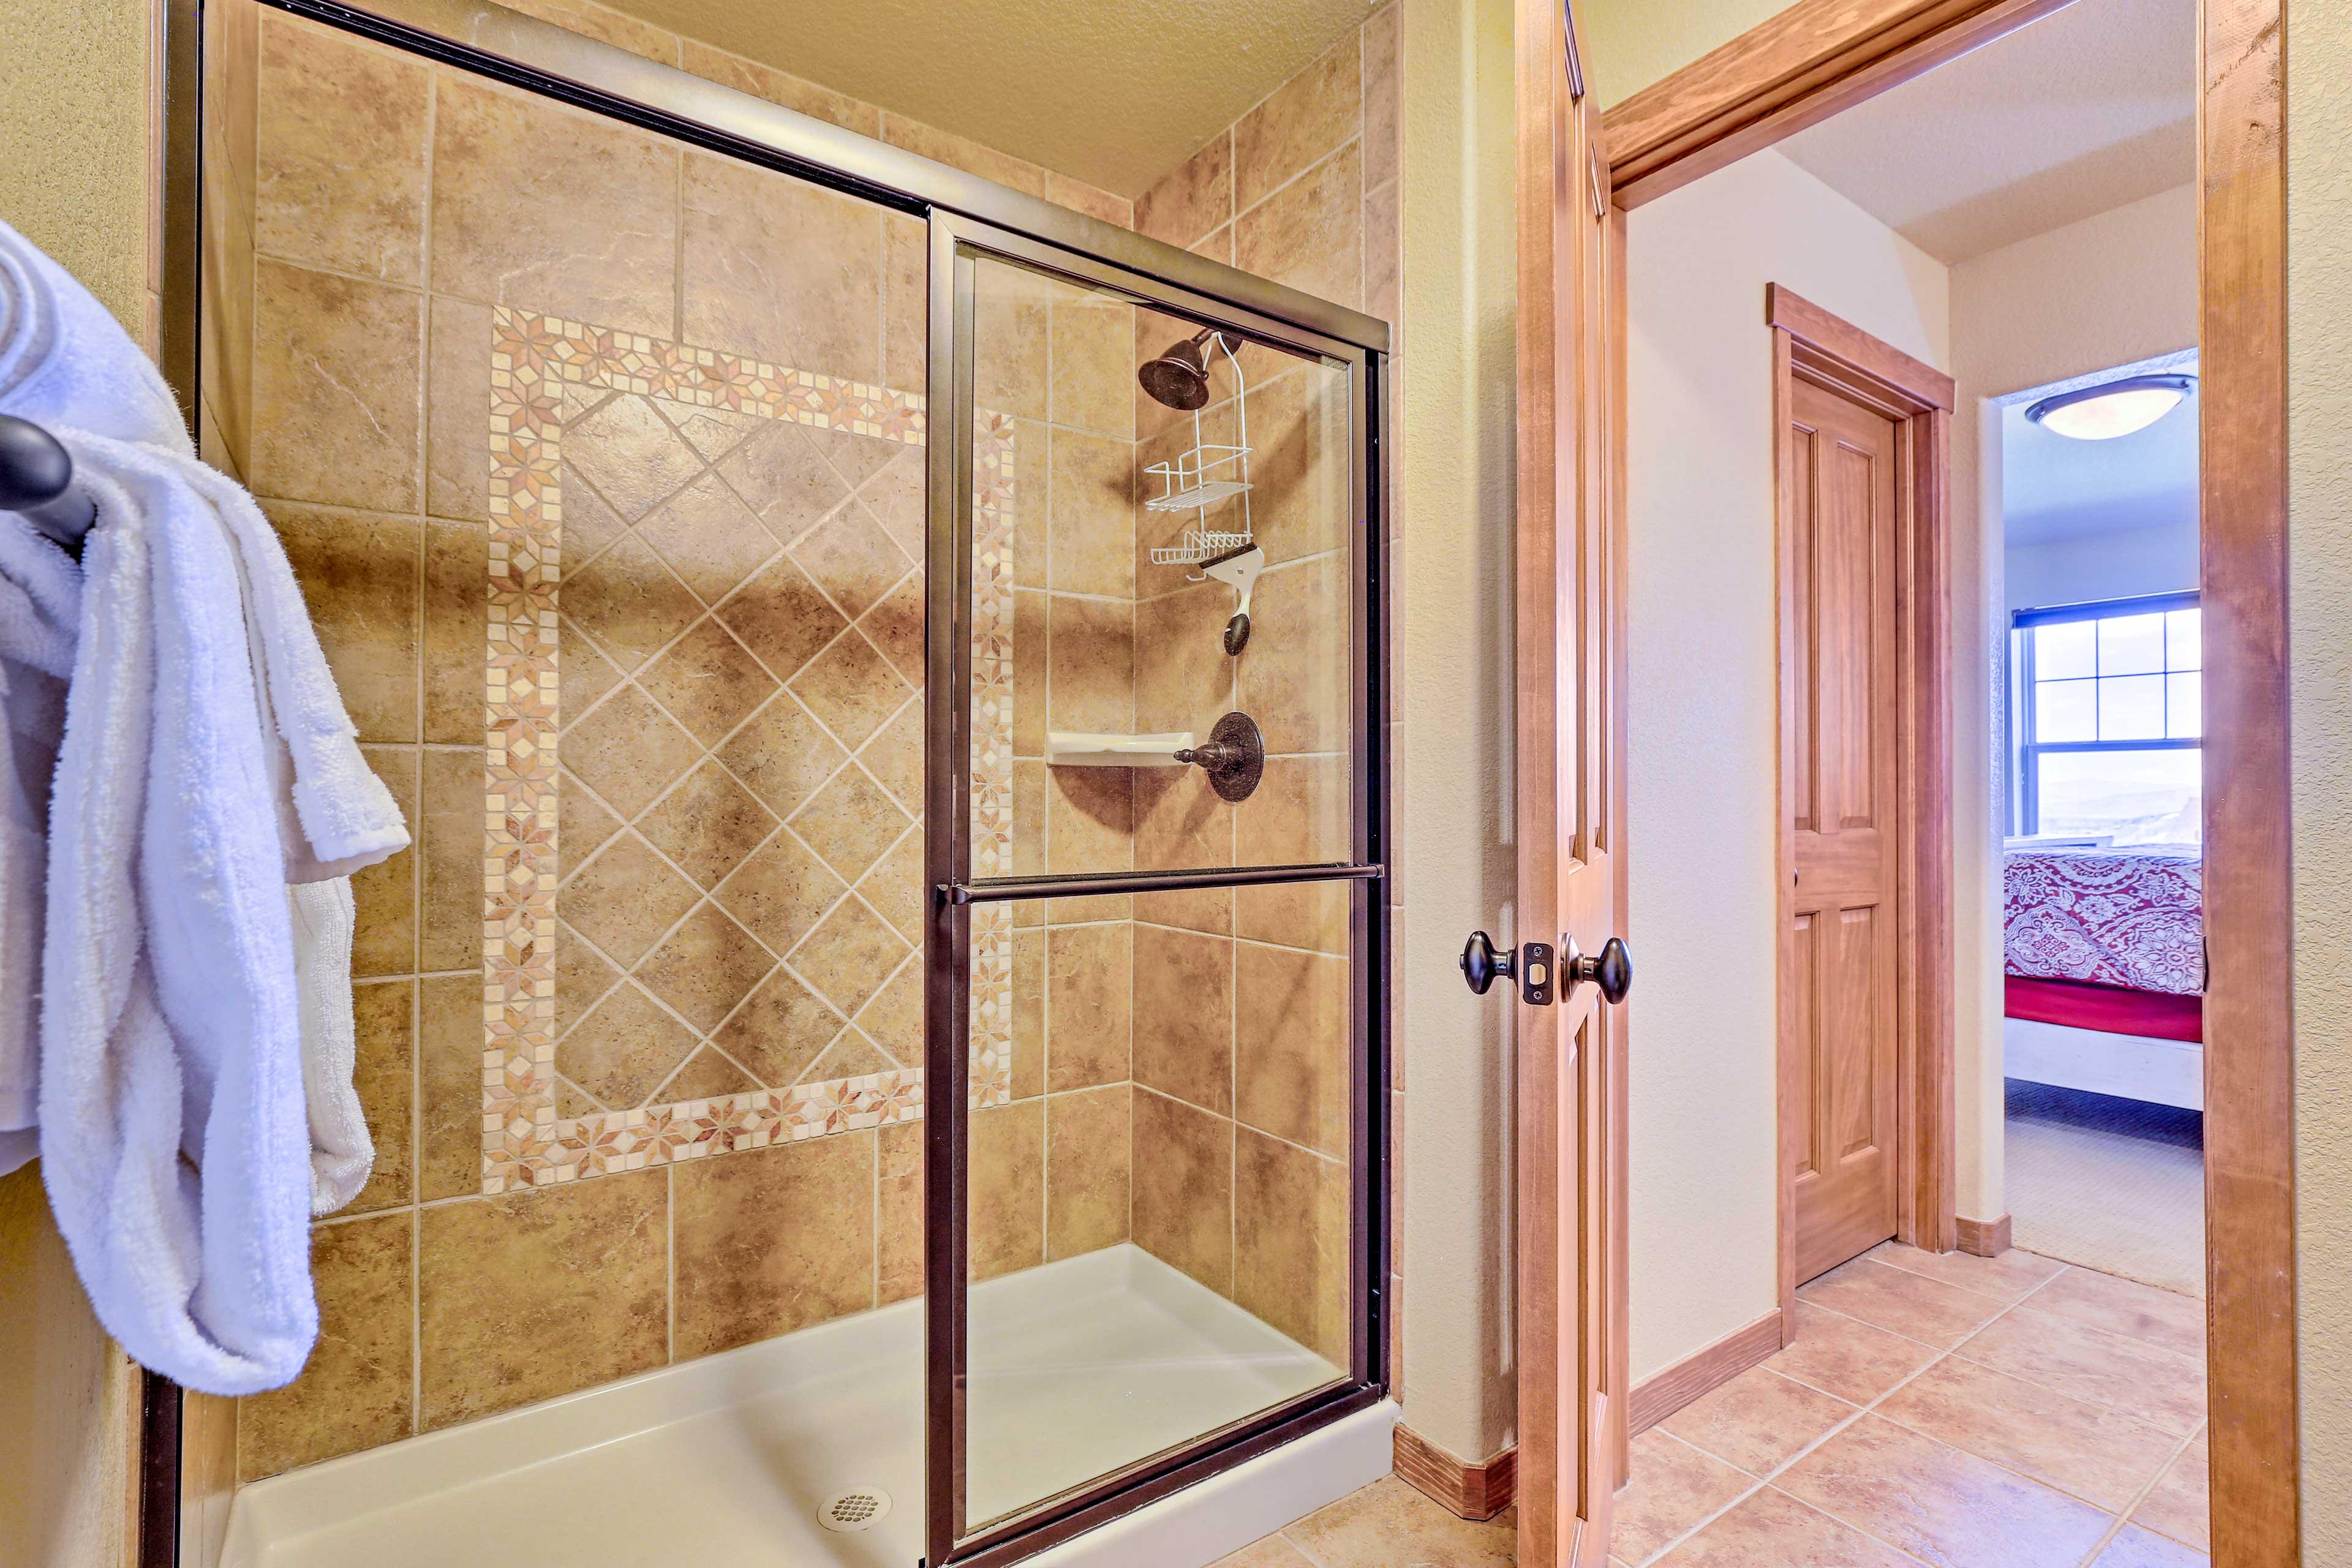 Rinse off the day's adventures in the en-suite bathroom.